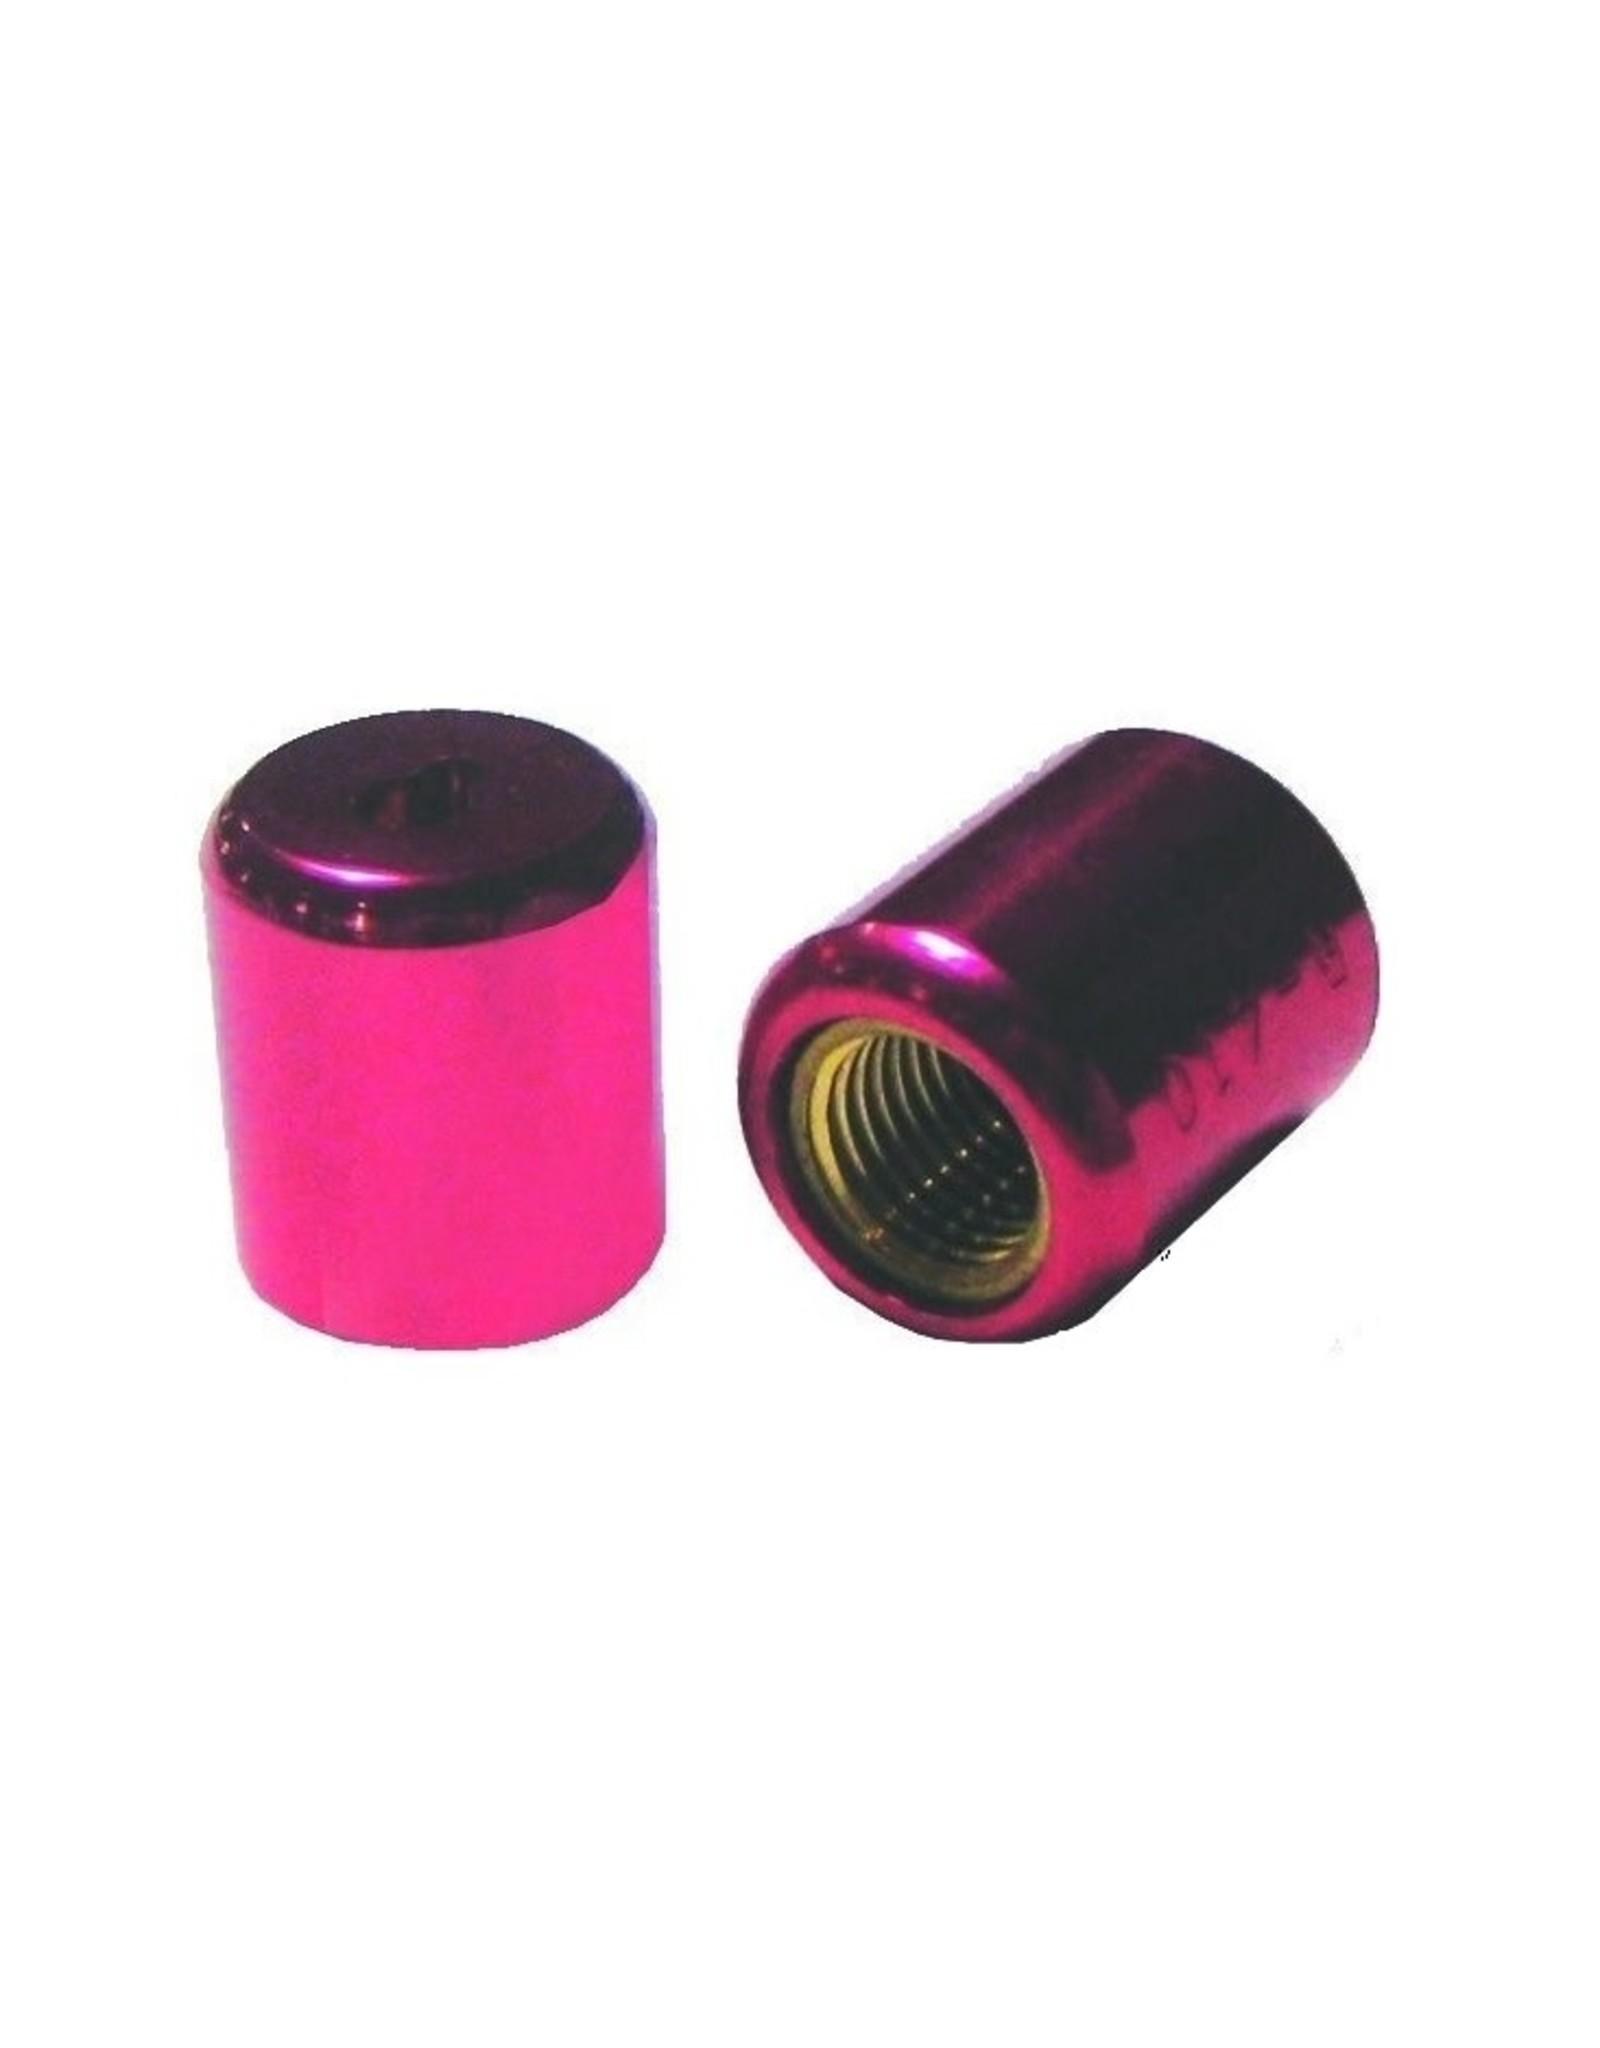 "Daikin Applied Americas NoVent  Refrigerant Safety Cap  Pink R410A  VRV Ductless  5/16"""